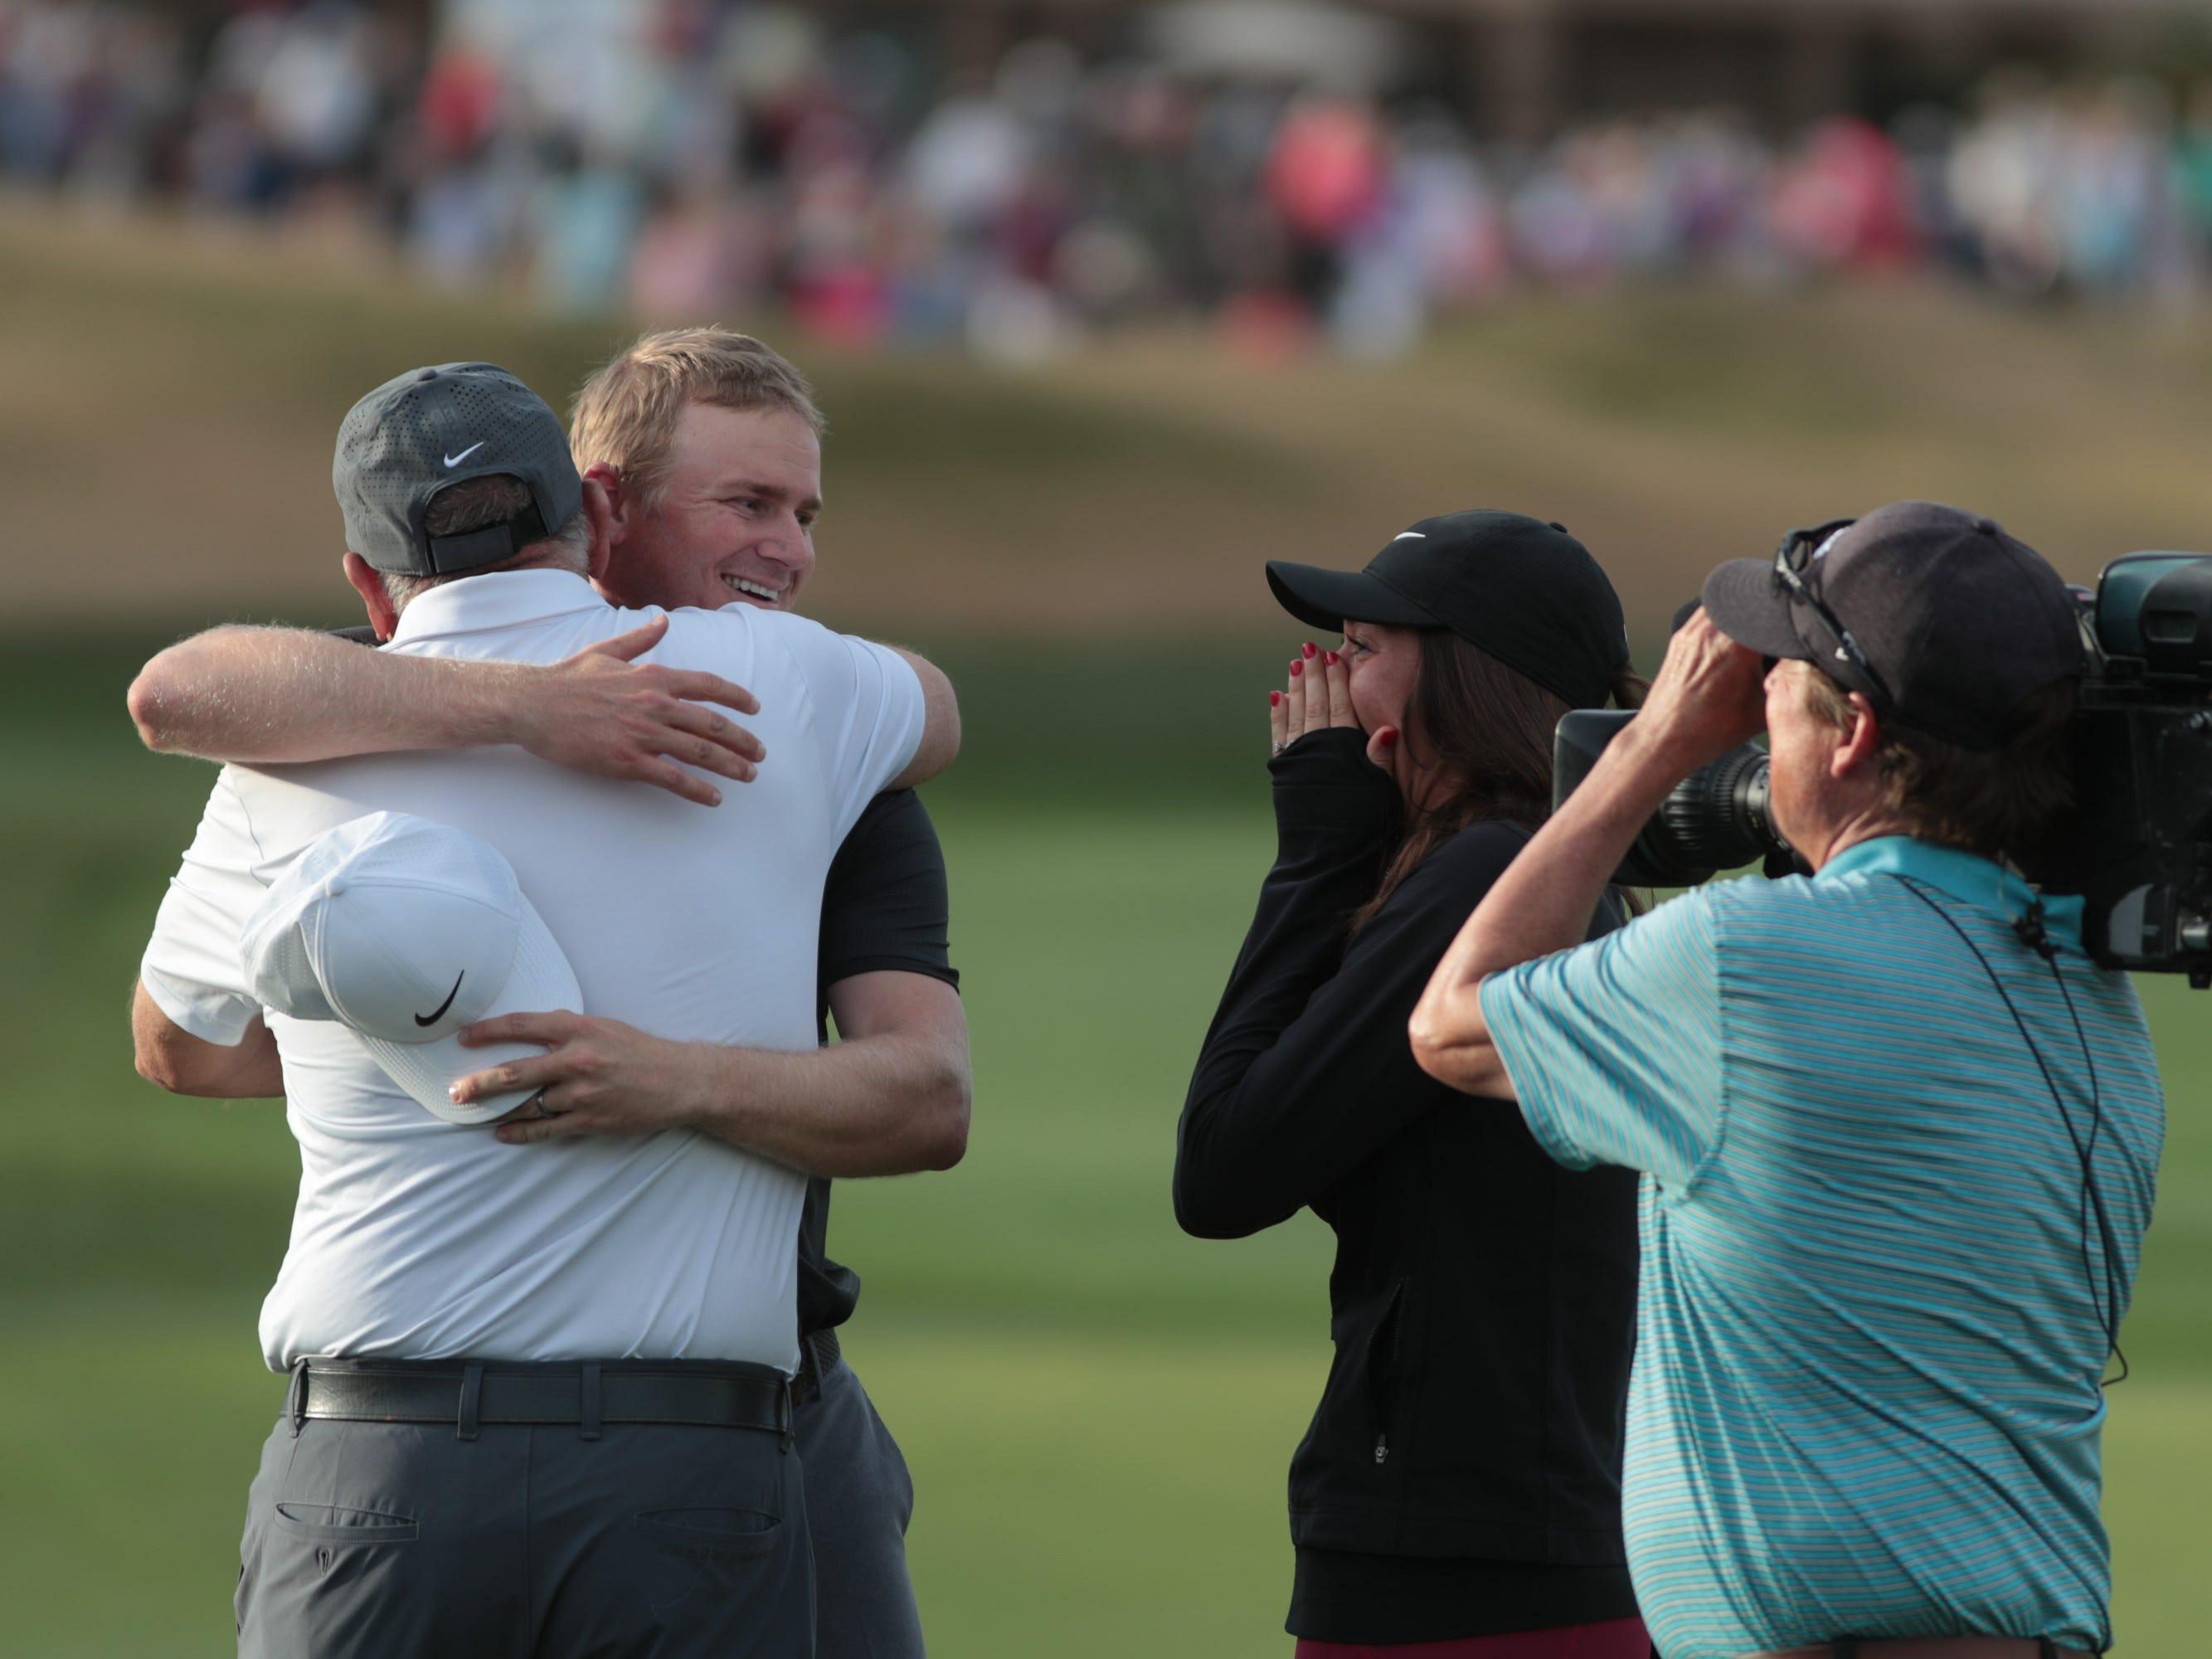 Adam Long celebrates after winning the 2019 Desert Classic, Sunday, January 20, 2019.